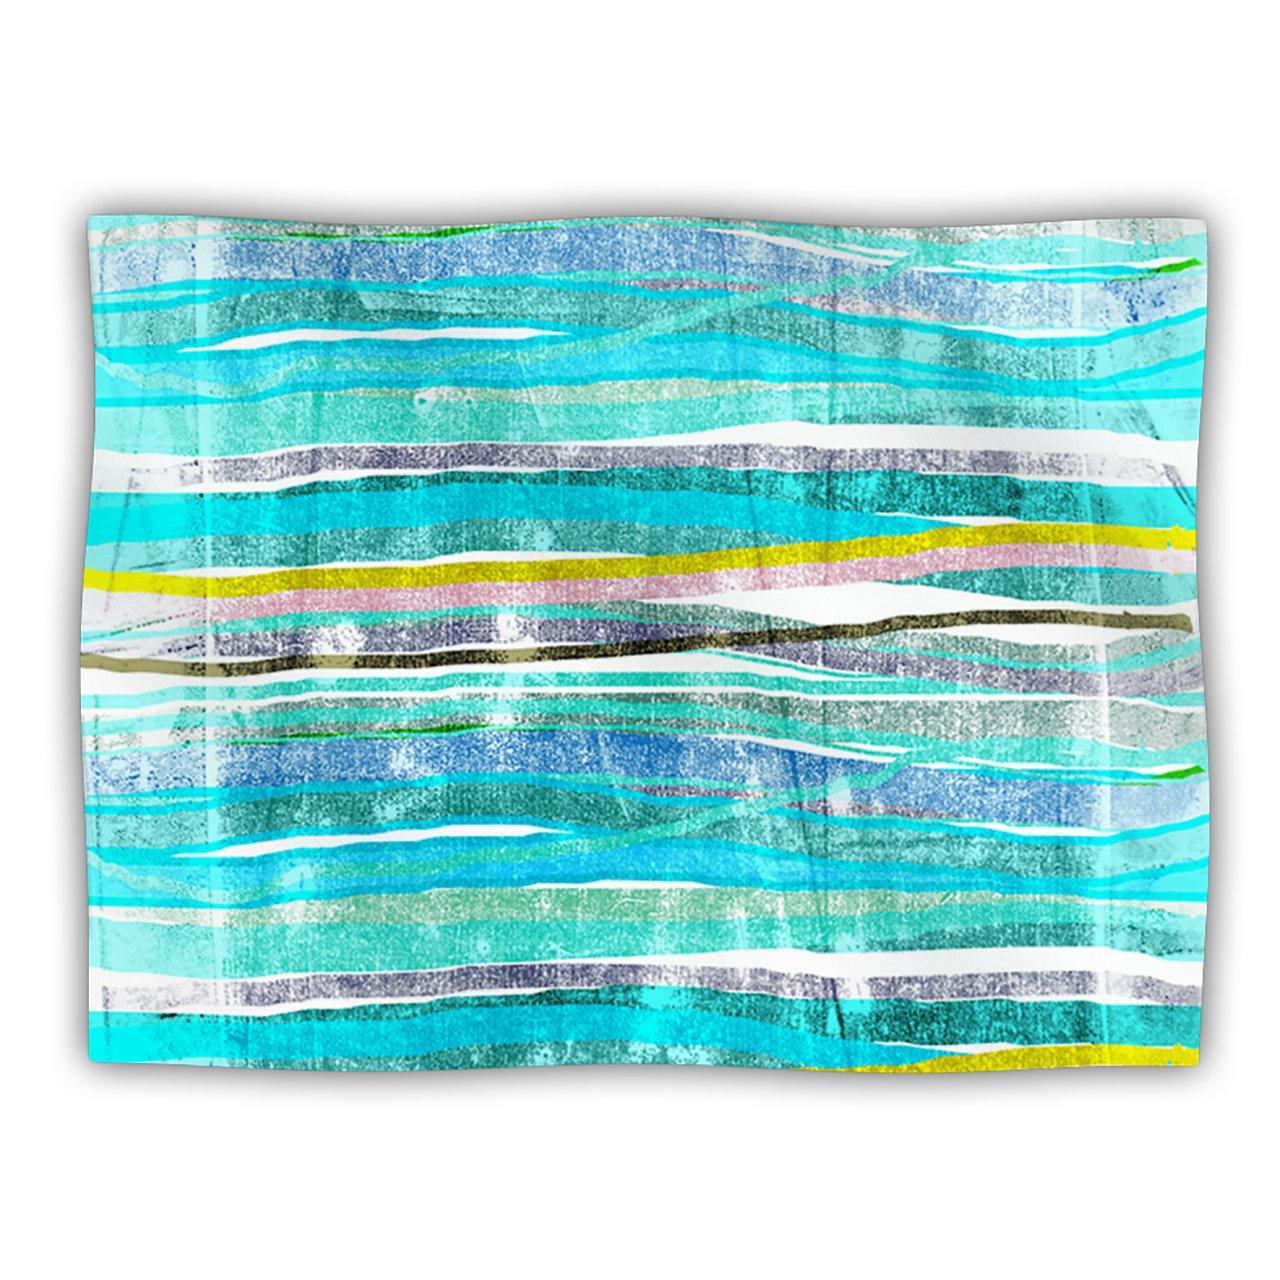 Kess InHouse Frederic Levy-Hadida ''Fancy Stripes Aqua'' Pet Blanket, 40 by 30-Inch